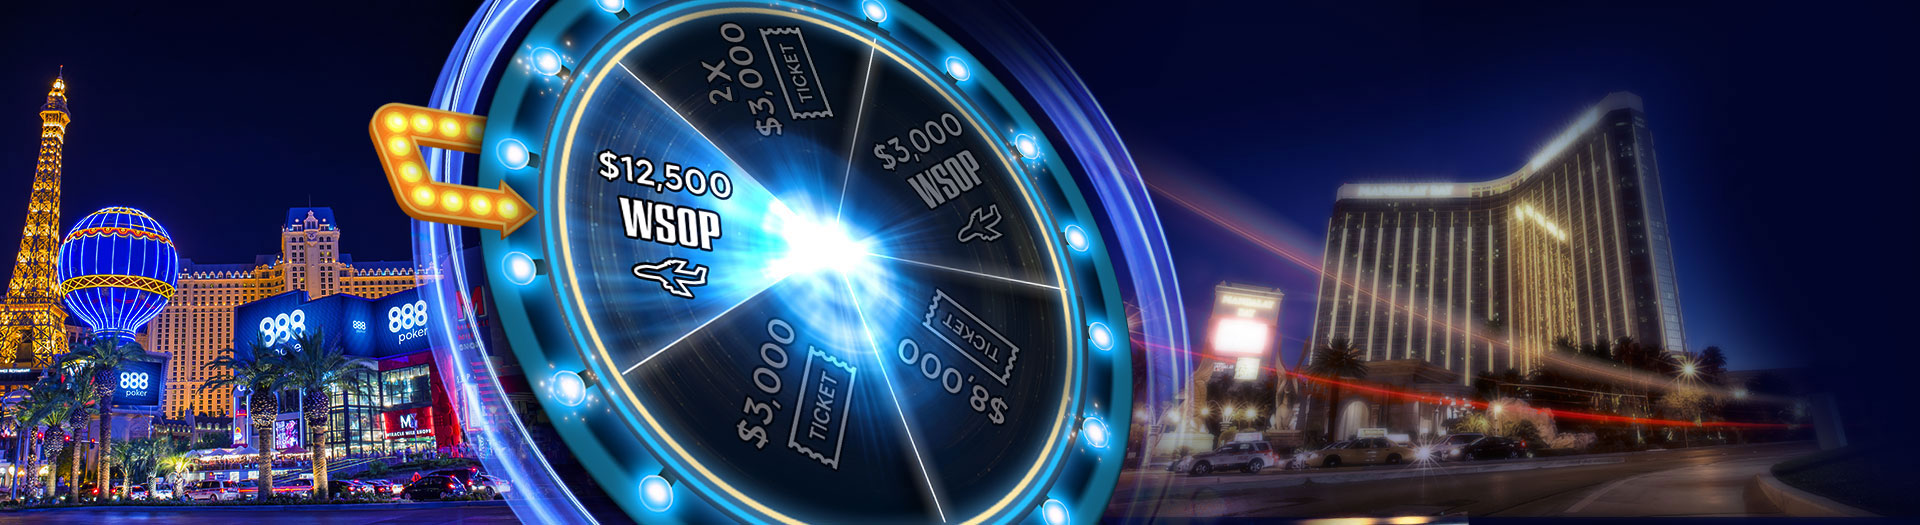 888 online casino gratis spielen online